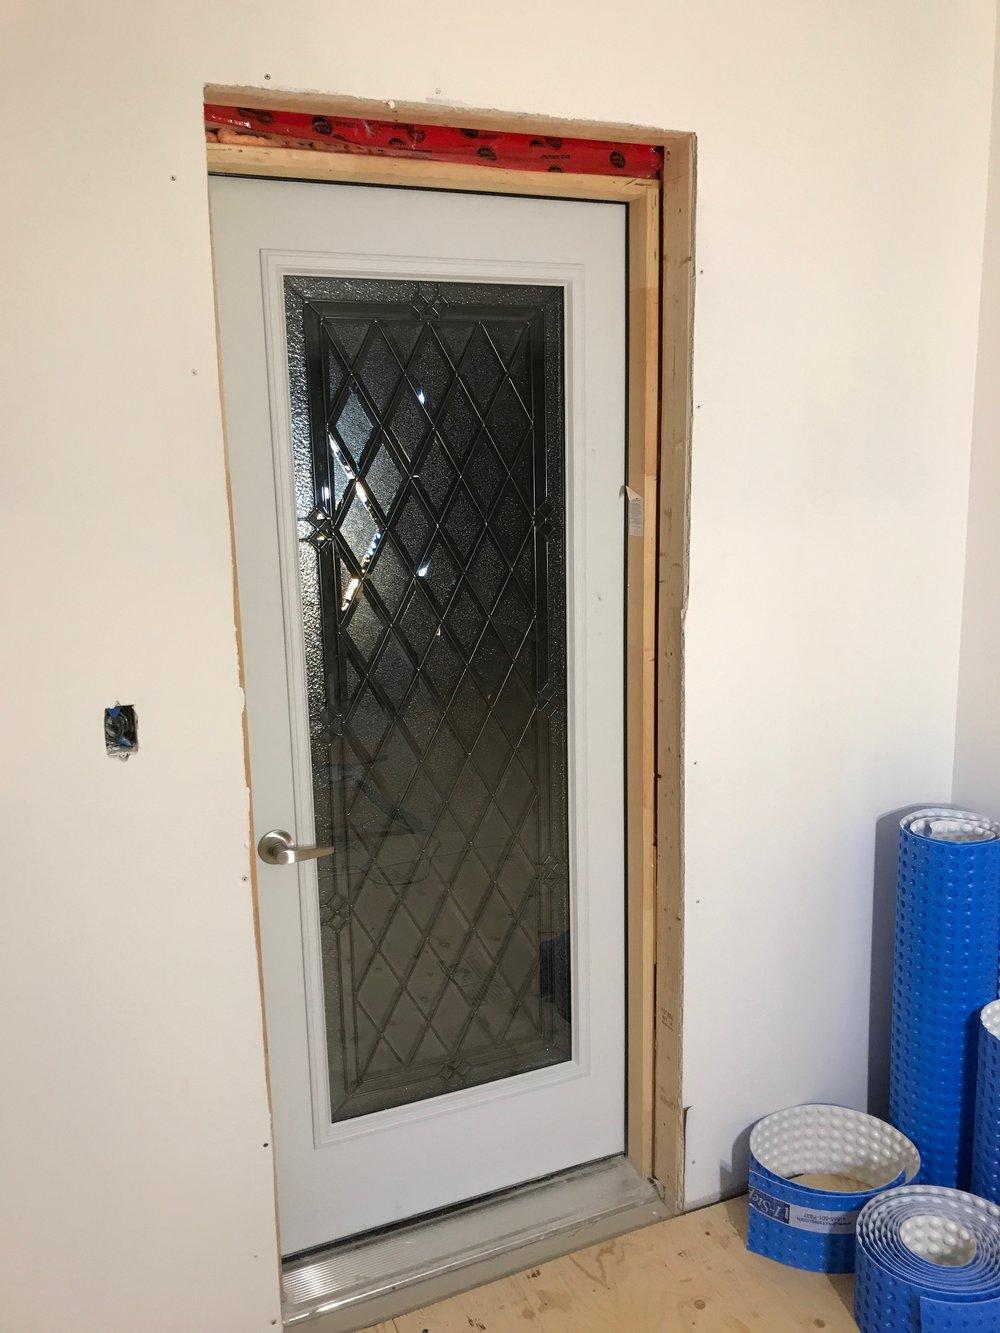 Cookstown-Decorative-Glass-door-inserts-Alliston-Ontario